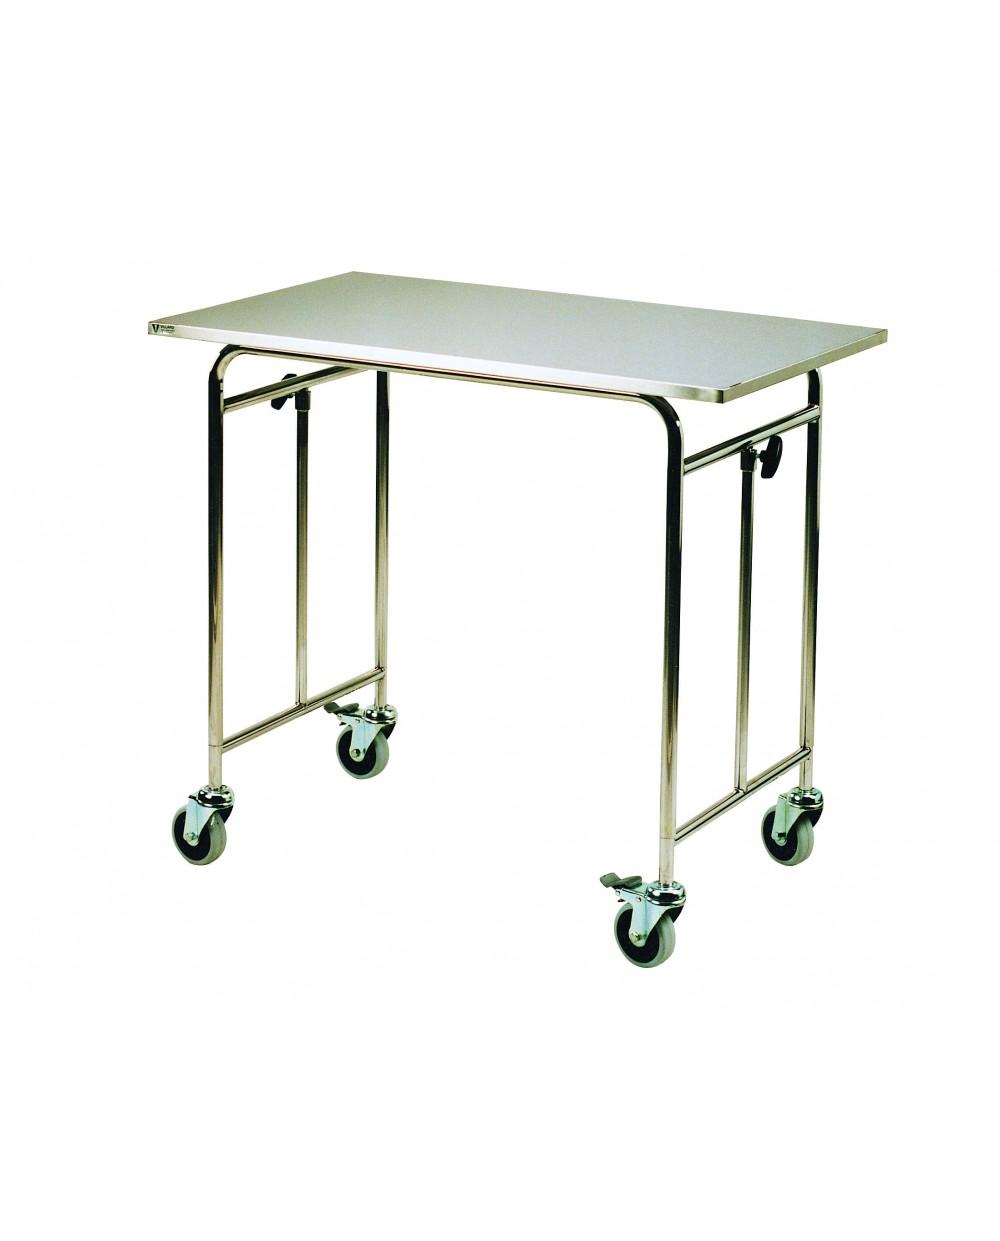 Table pont inox 100 x 60 cm villard for Table cuisine 60 x 100